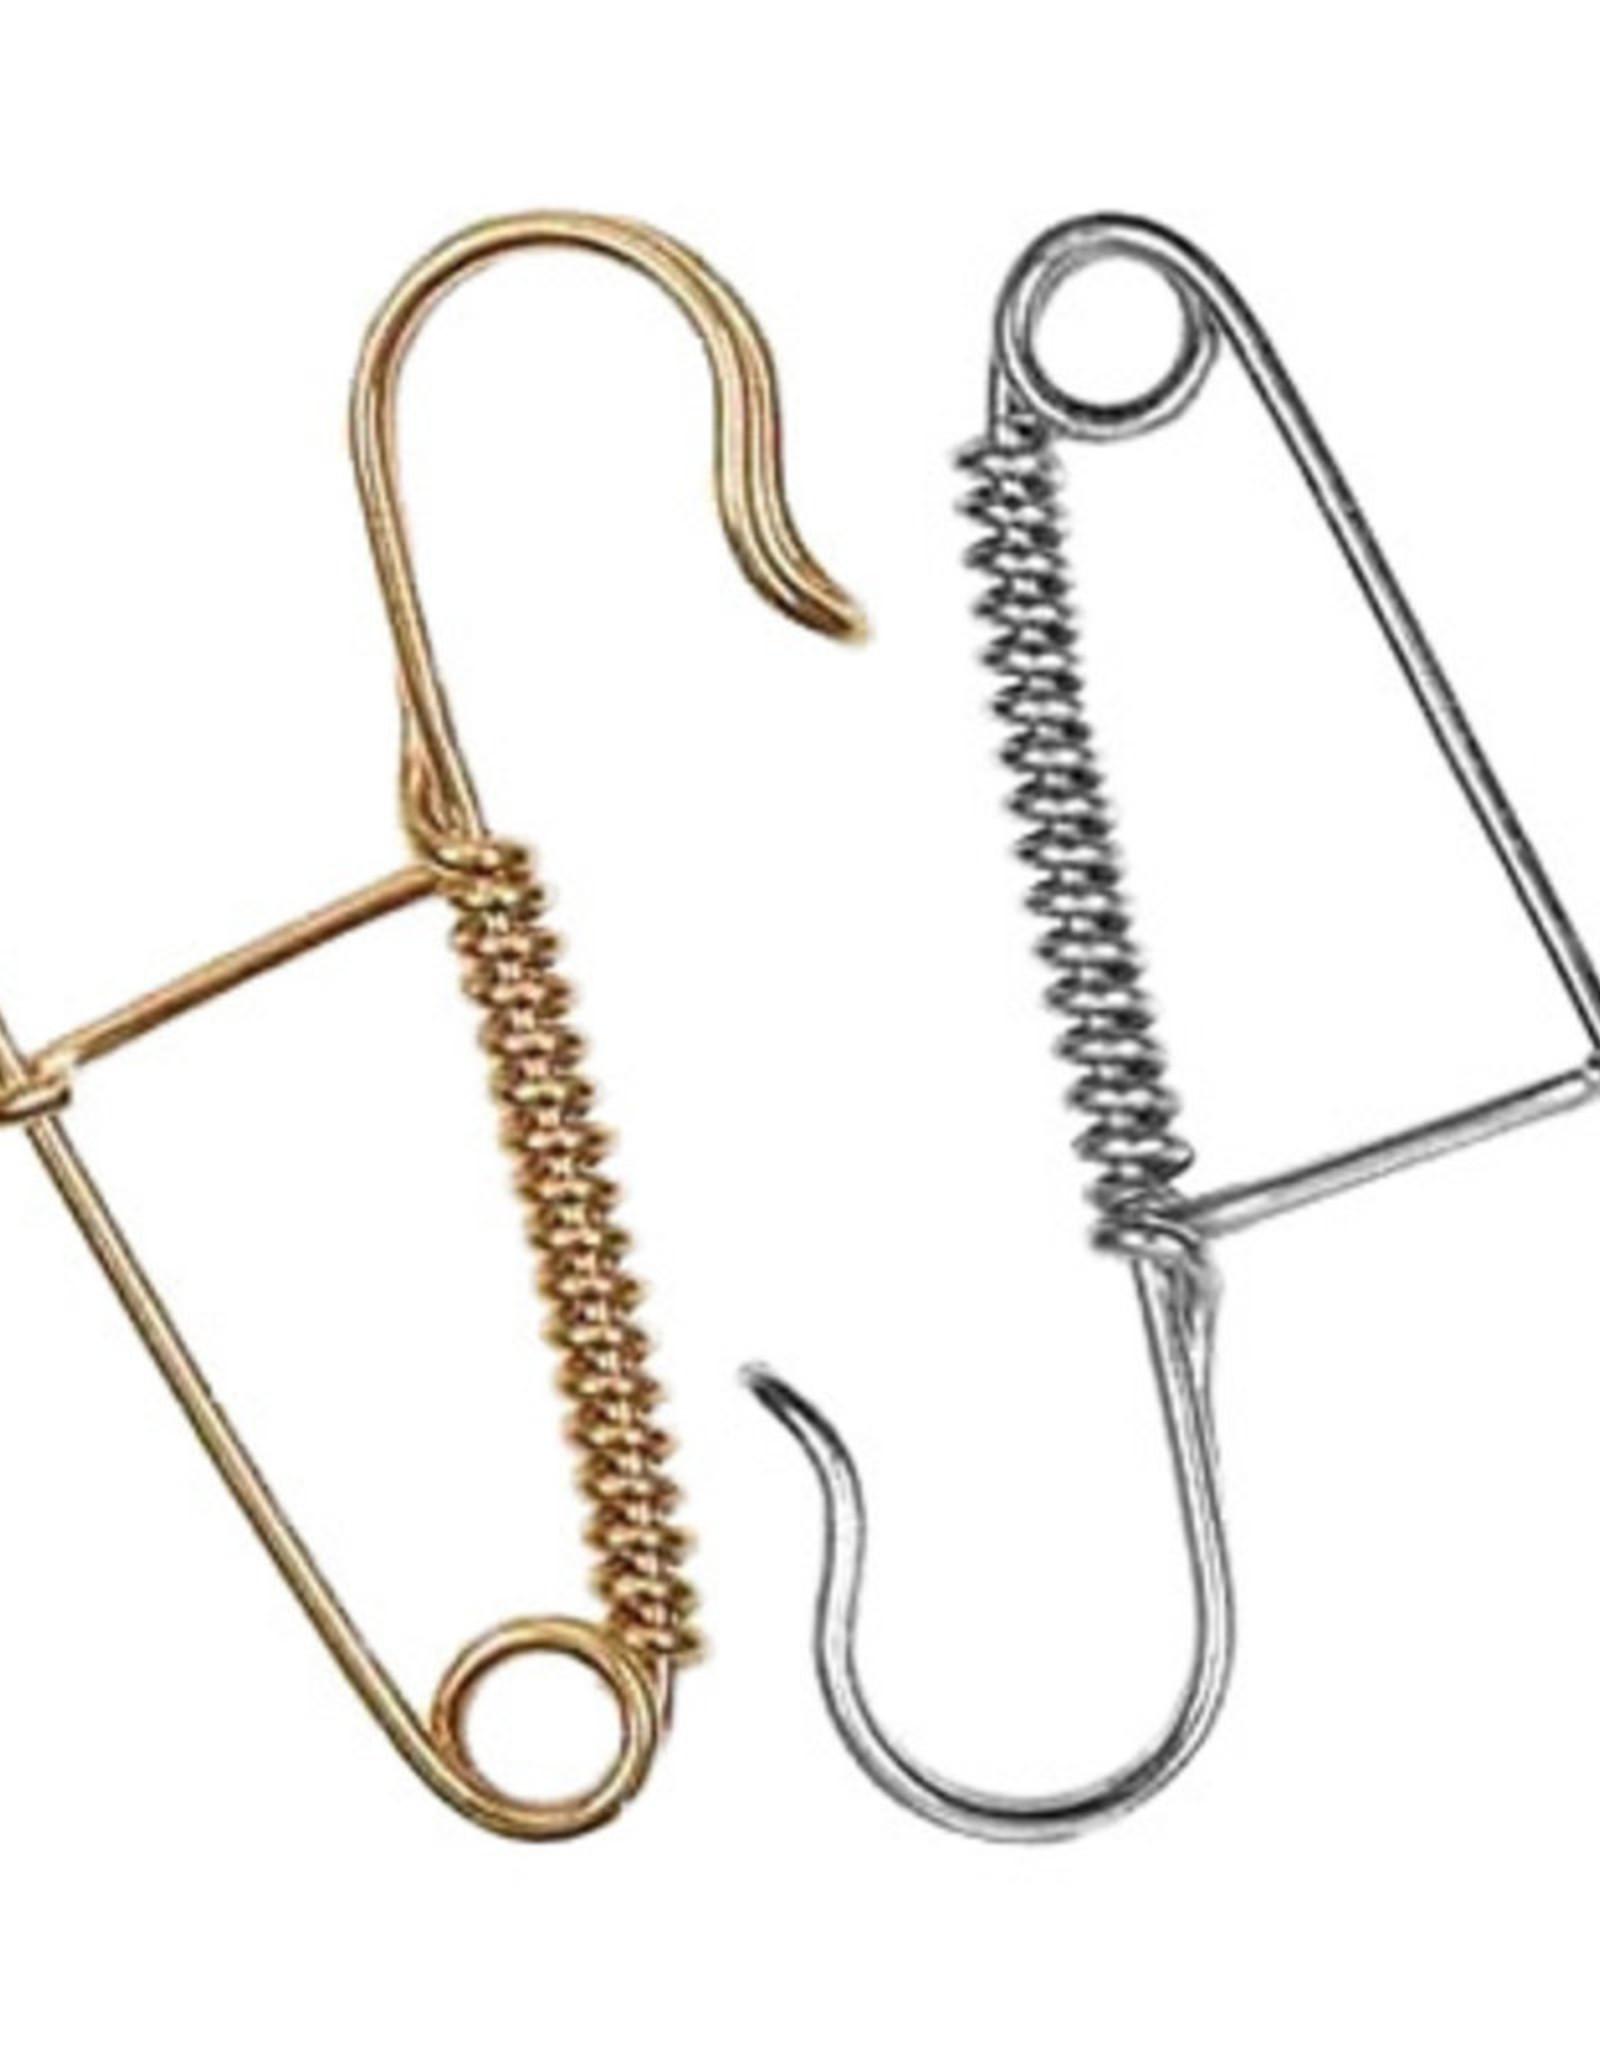 Portugese Knitting Pin